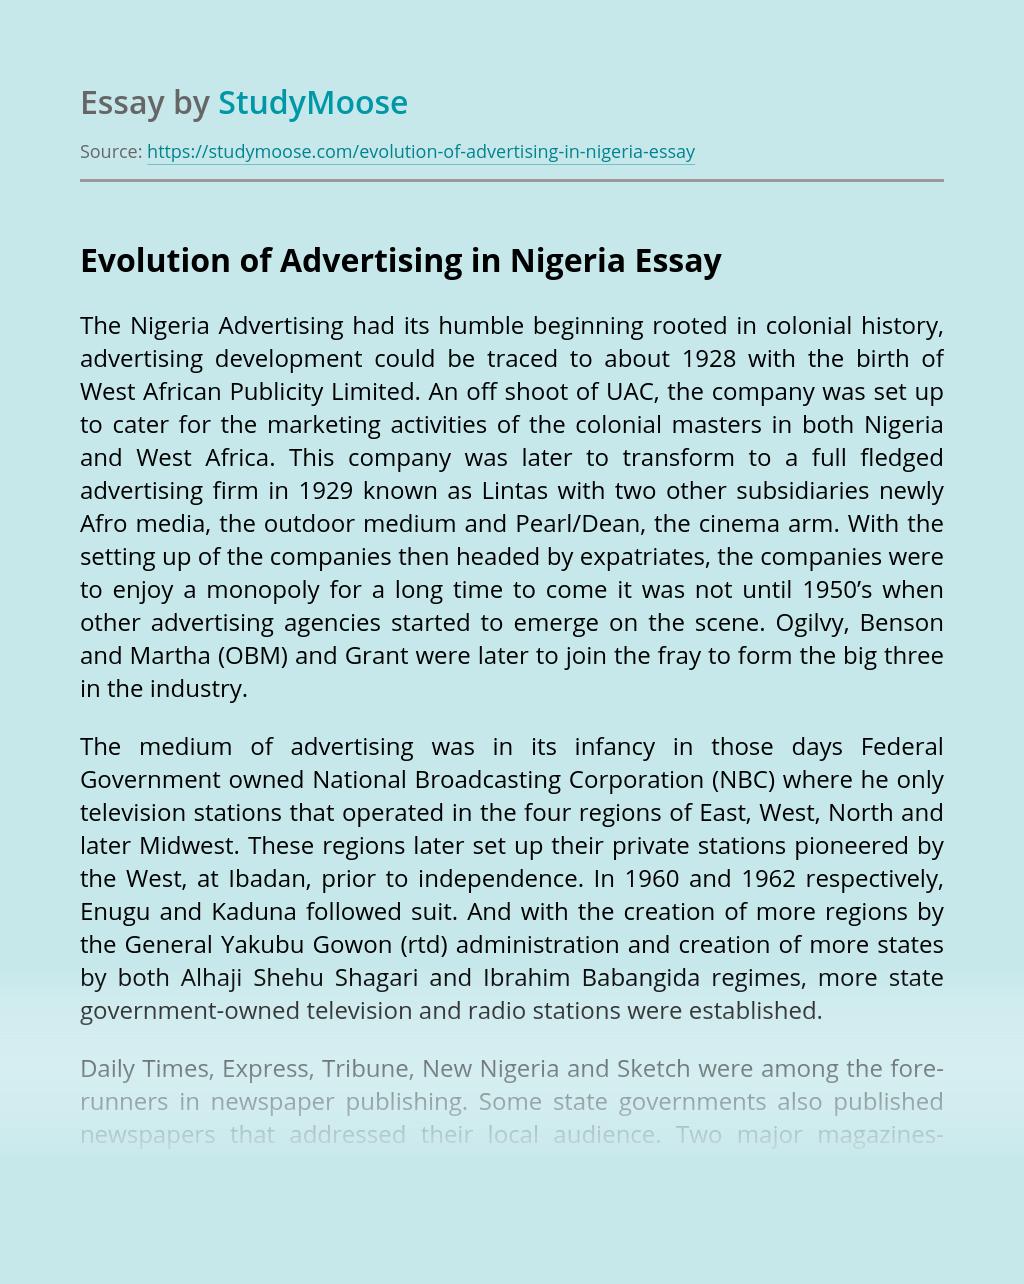 Evolution of Advertising in Nigeria